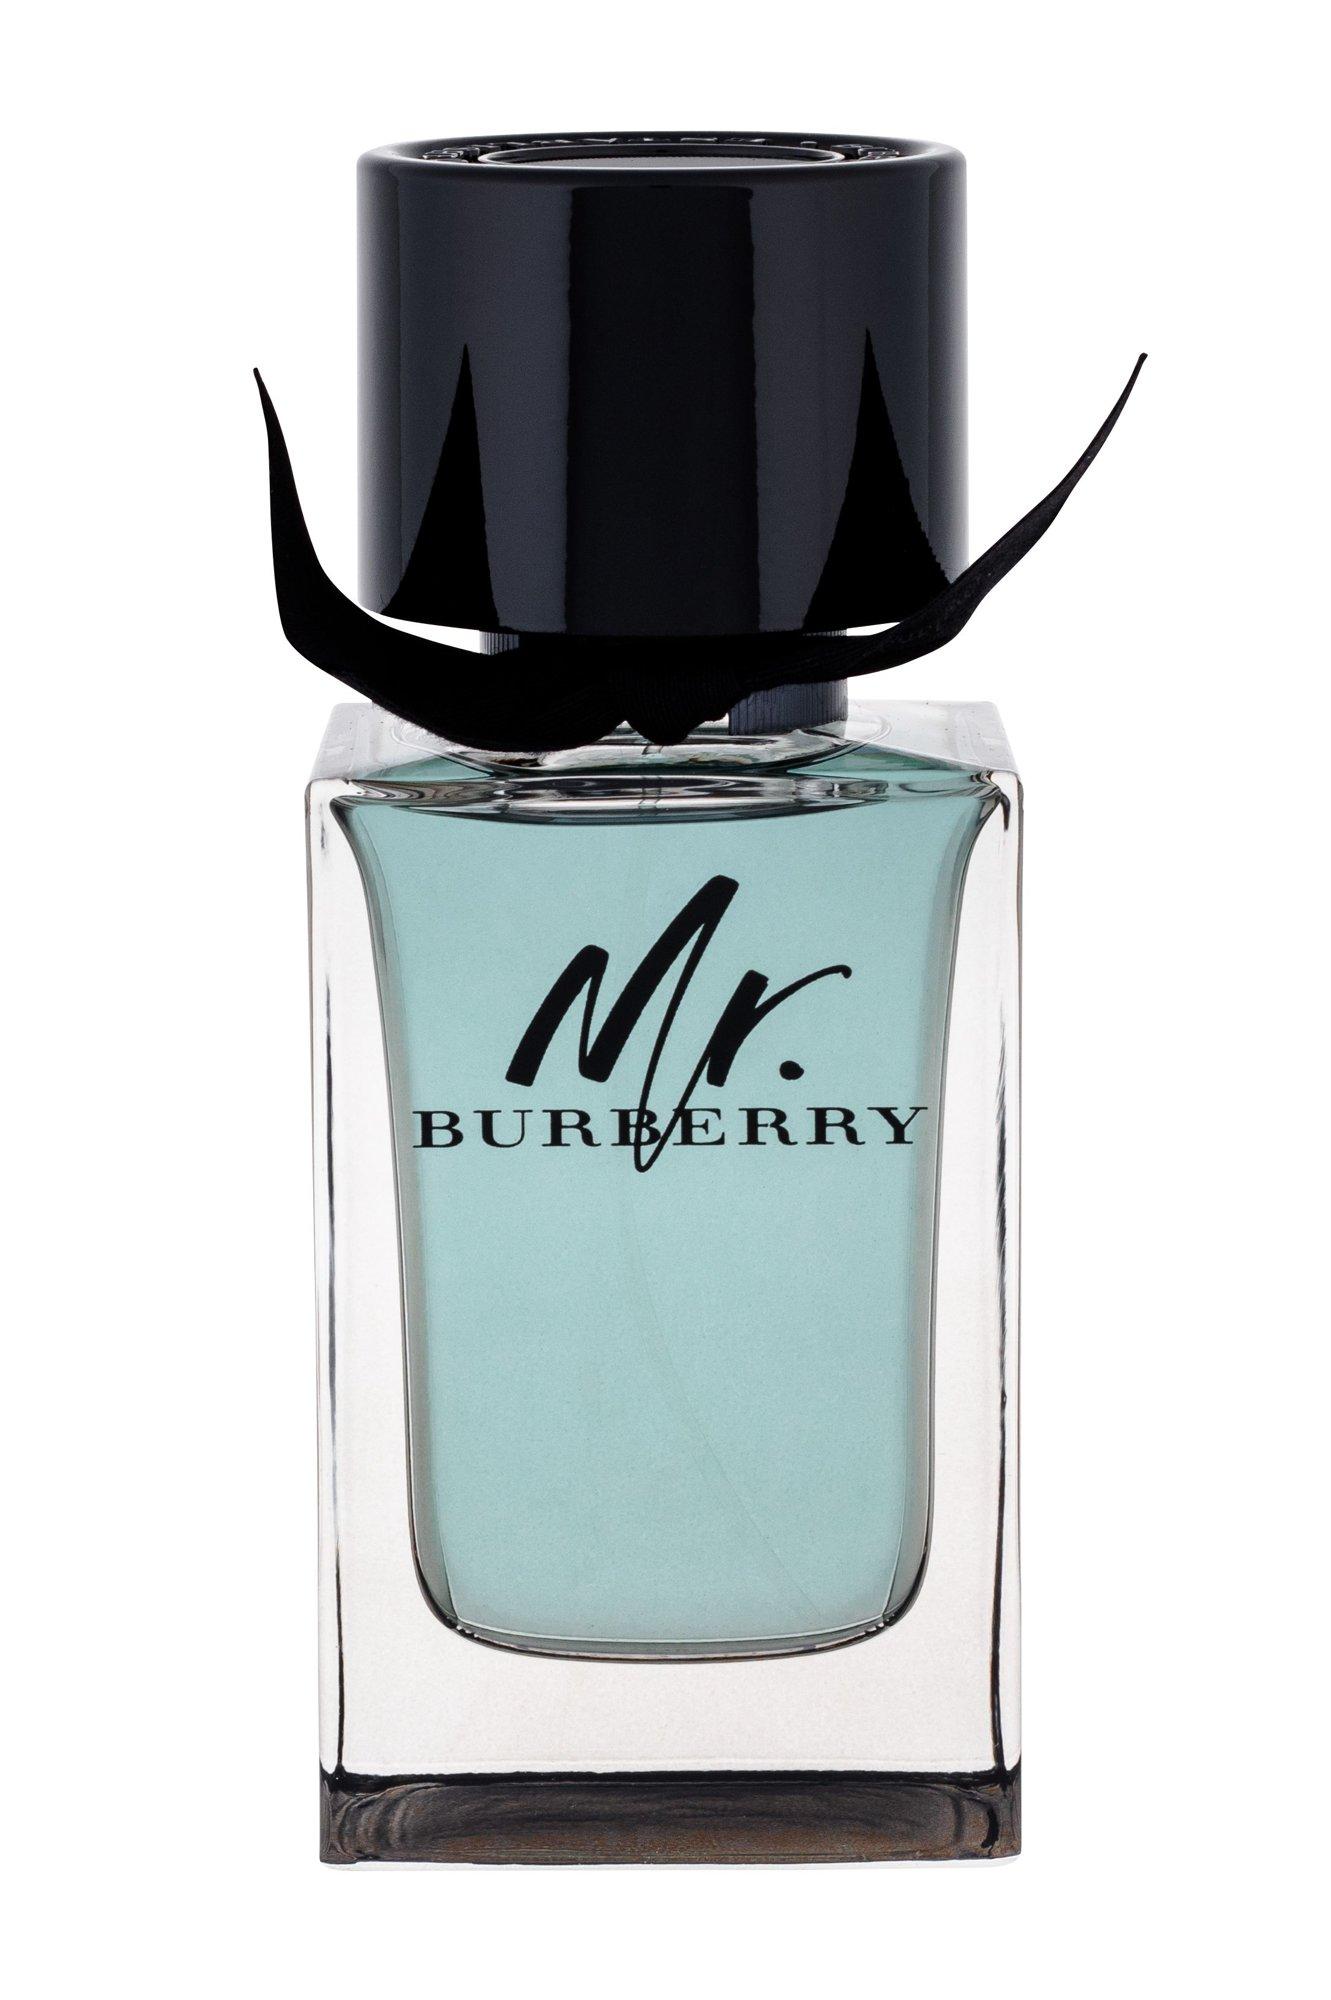 Burberry Mr. Burberry EDT 100ml